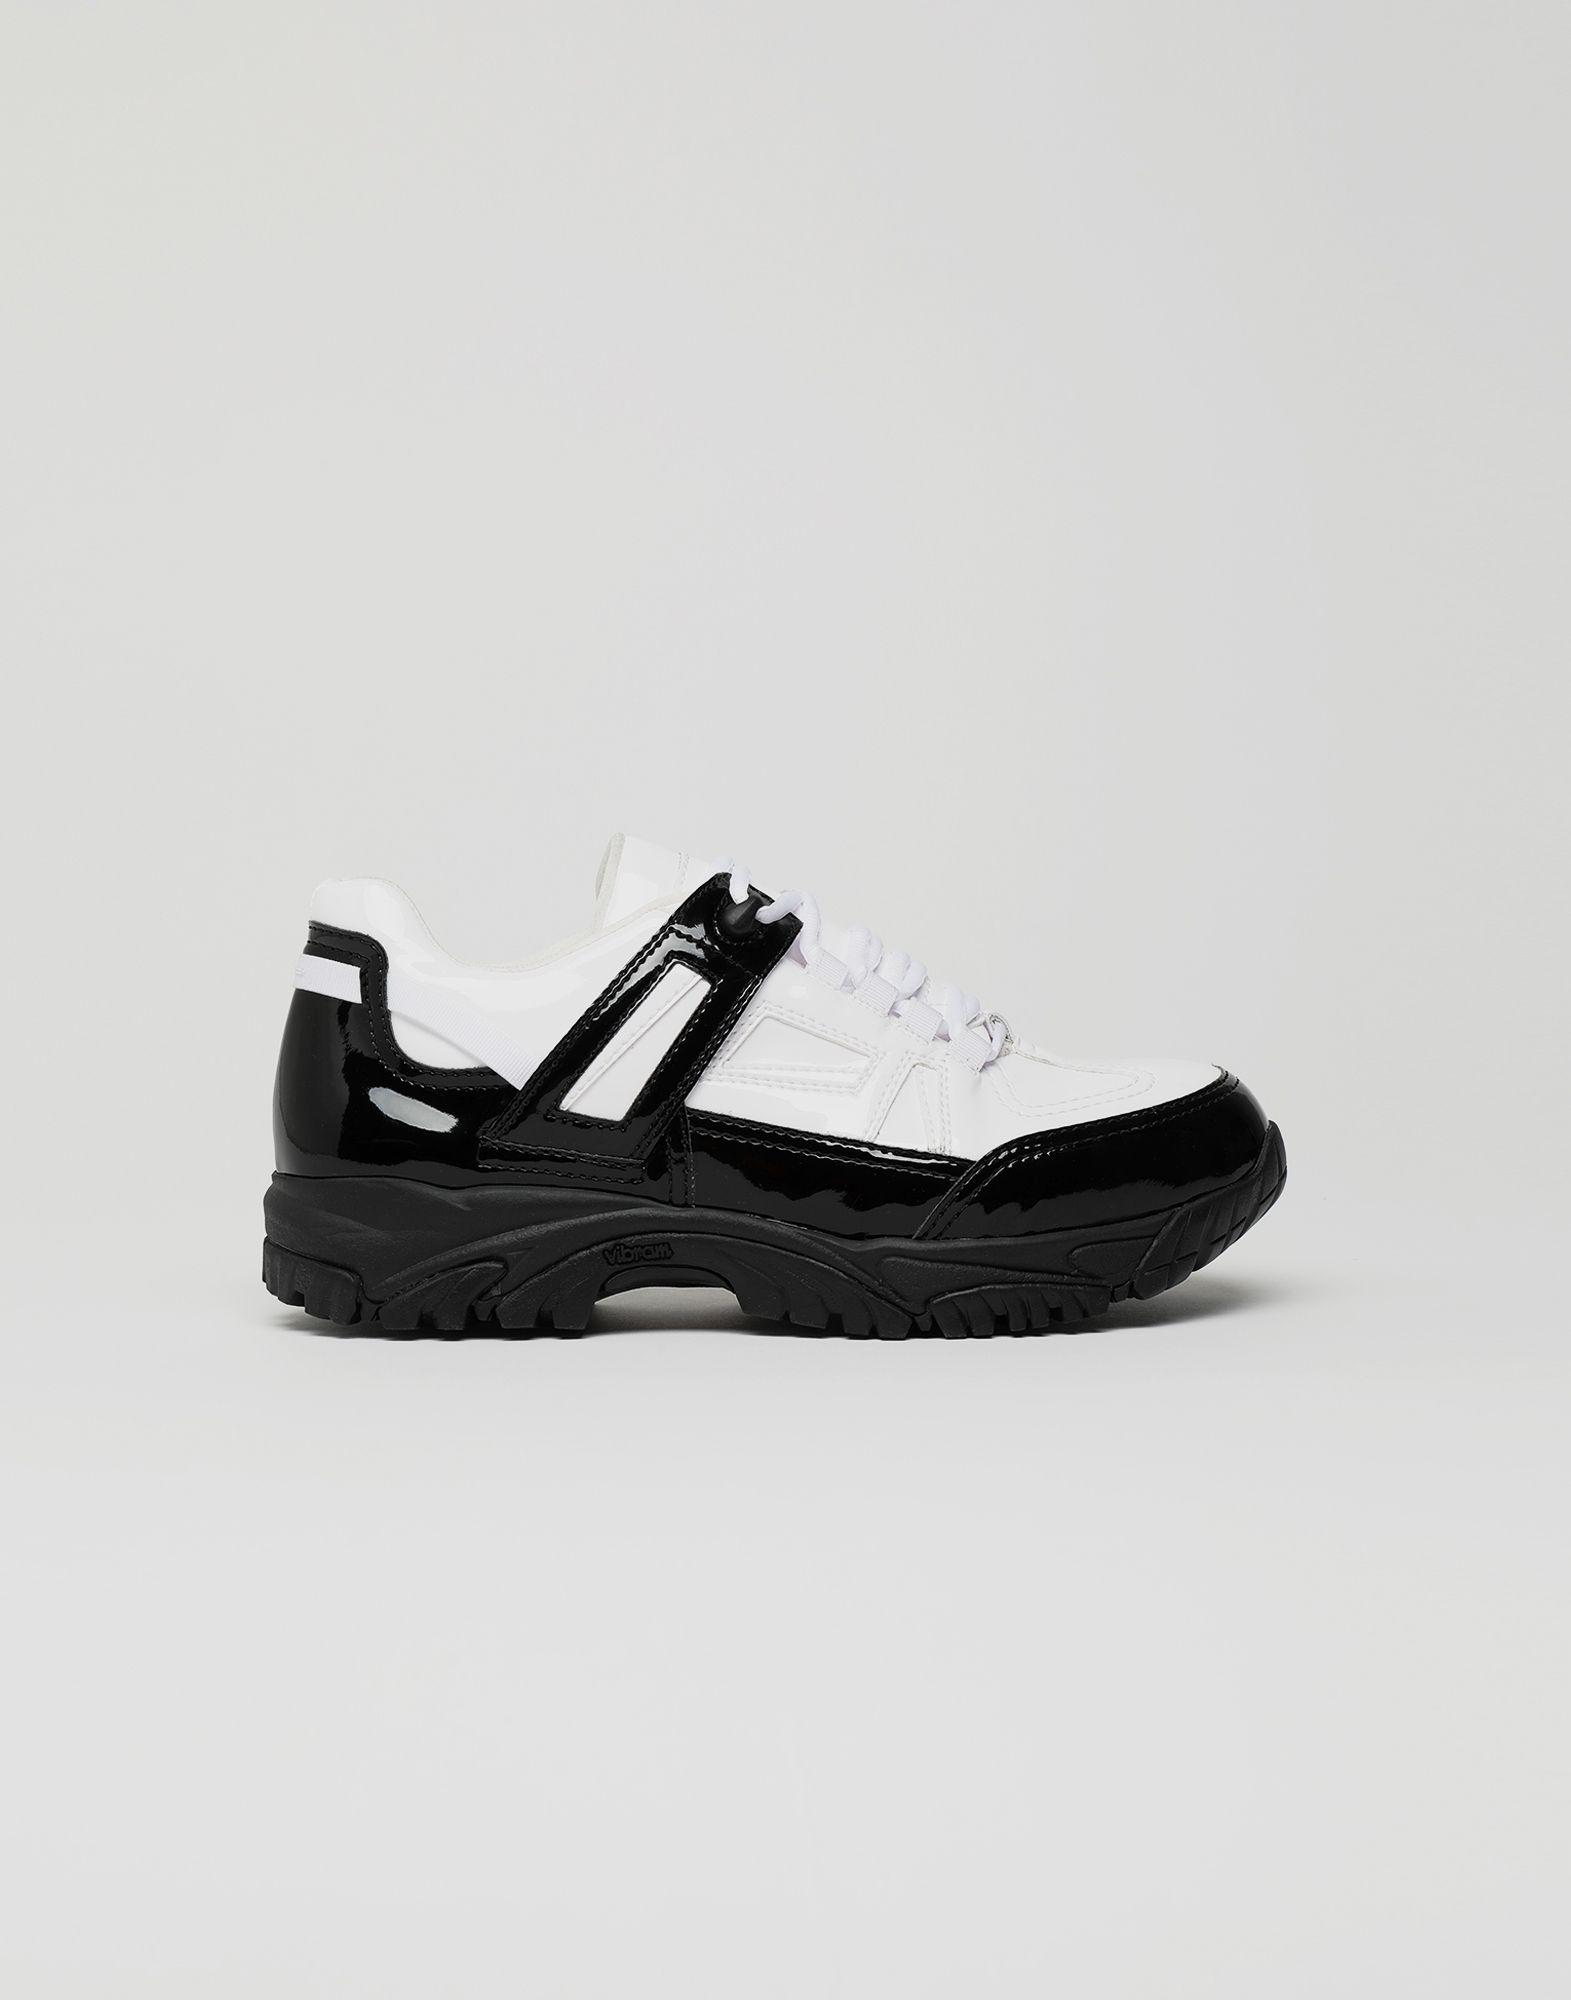 MAISON MARGIELA Sneakers Security aus Lackleder Sneakers Herren f